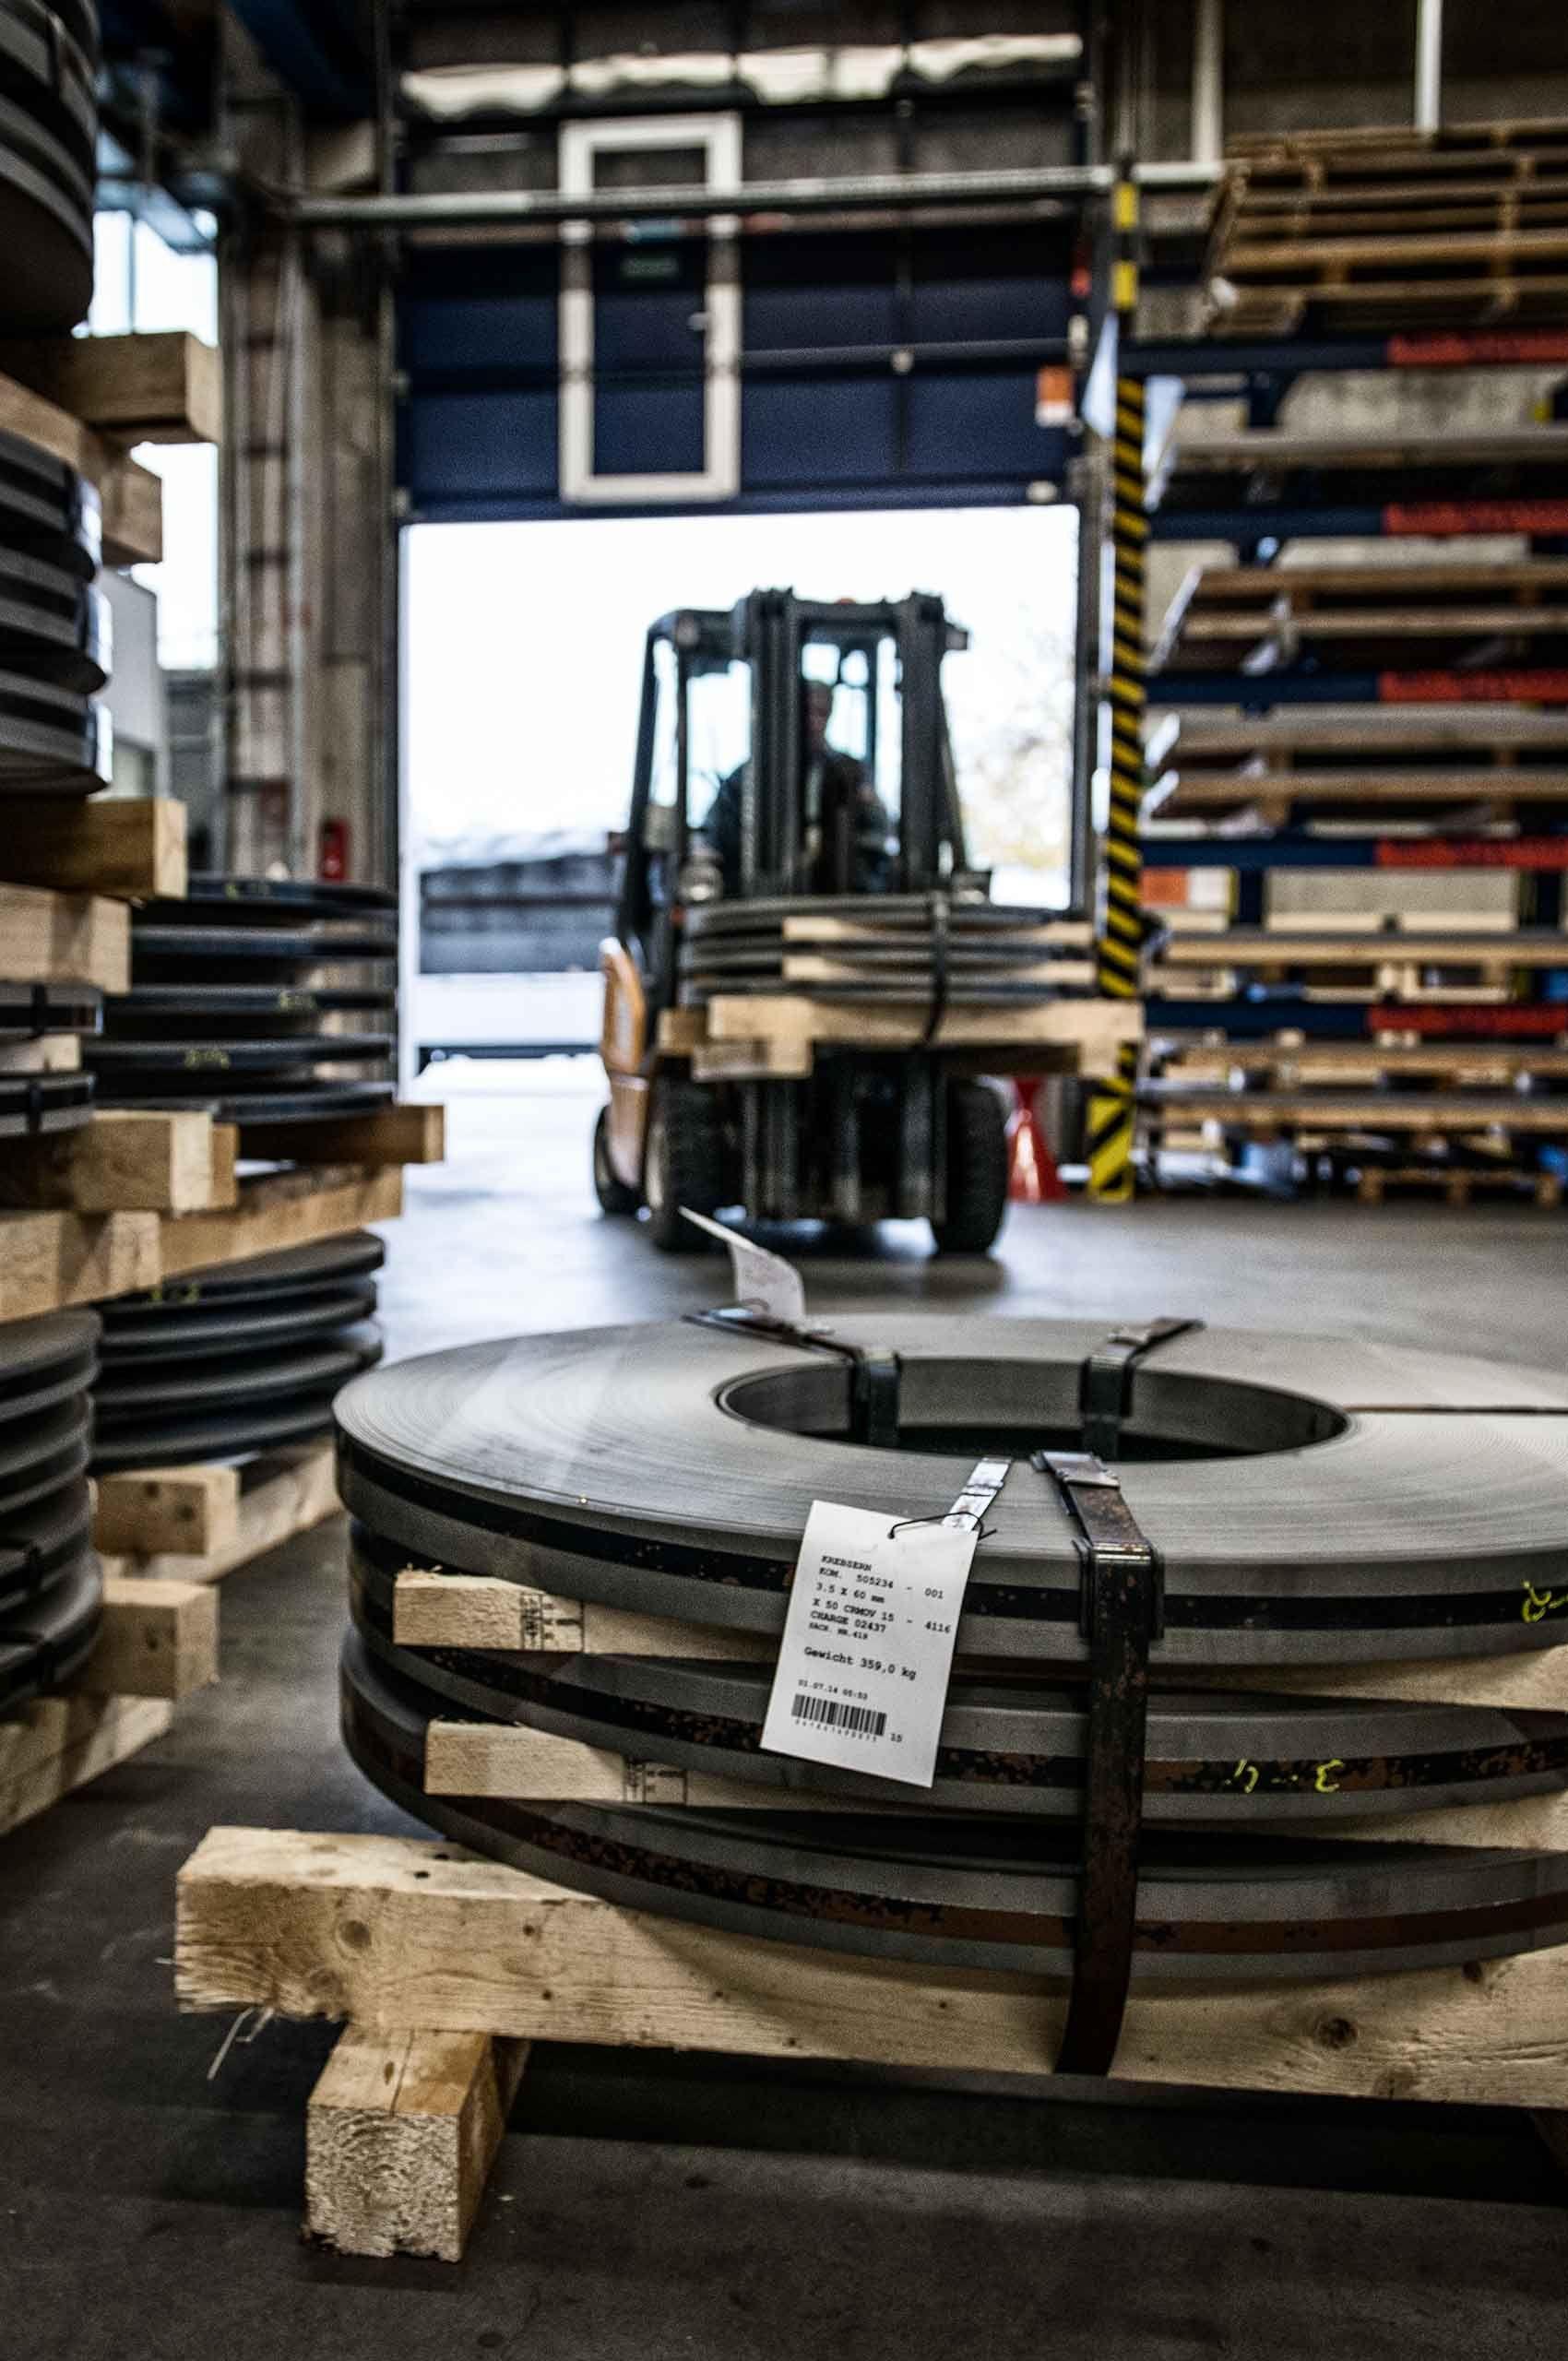 material-loading-wustof-factory-solingen-germany-by-HenrikOlundPhotography.jpg